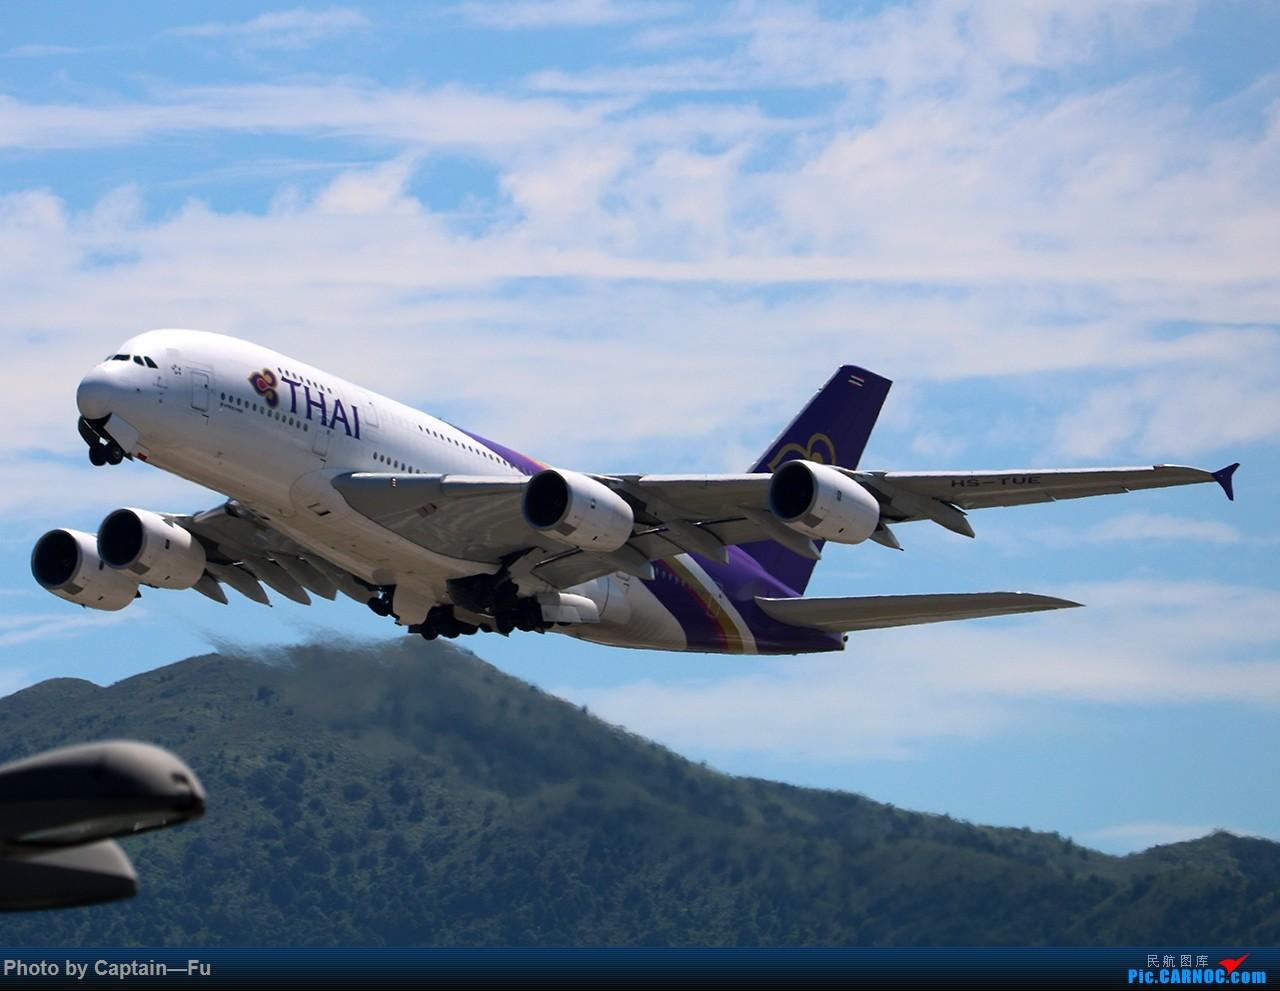 Re:[原创]香港拍机 AIRBUS A380-800 HS-TUE 中国香港国际机场